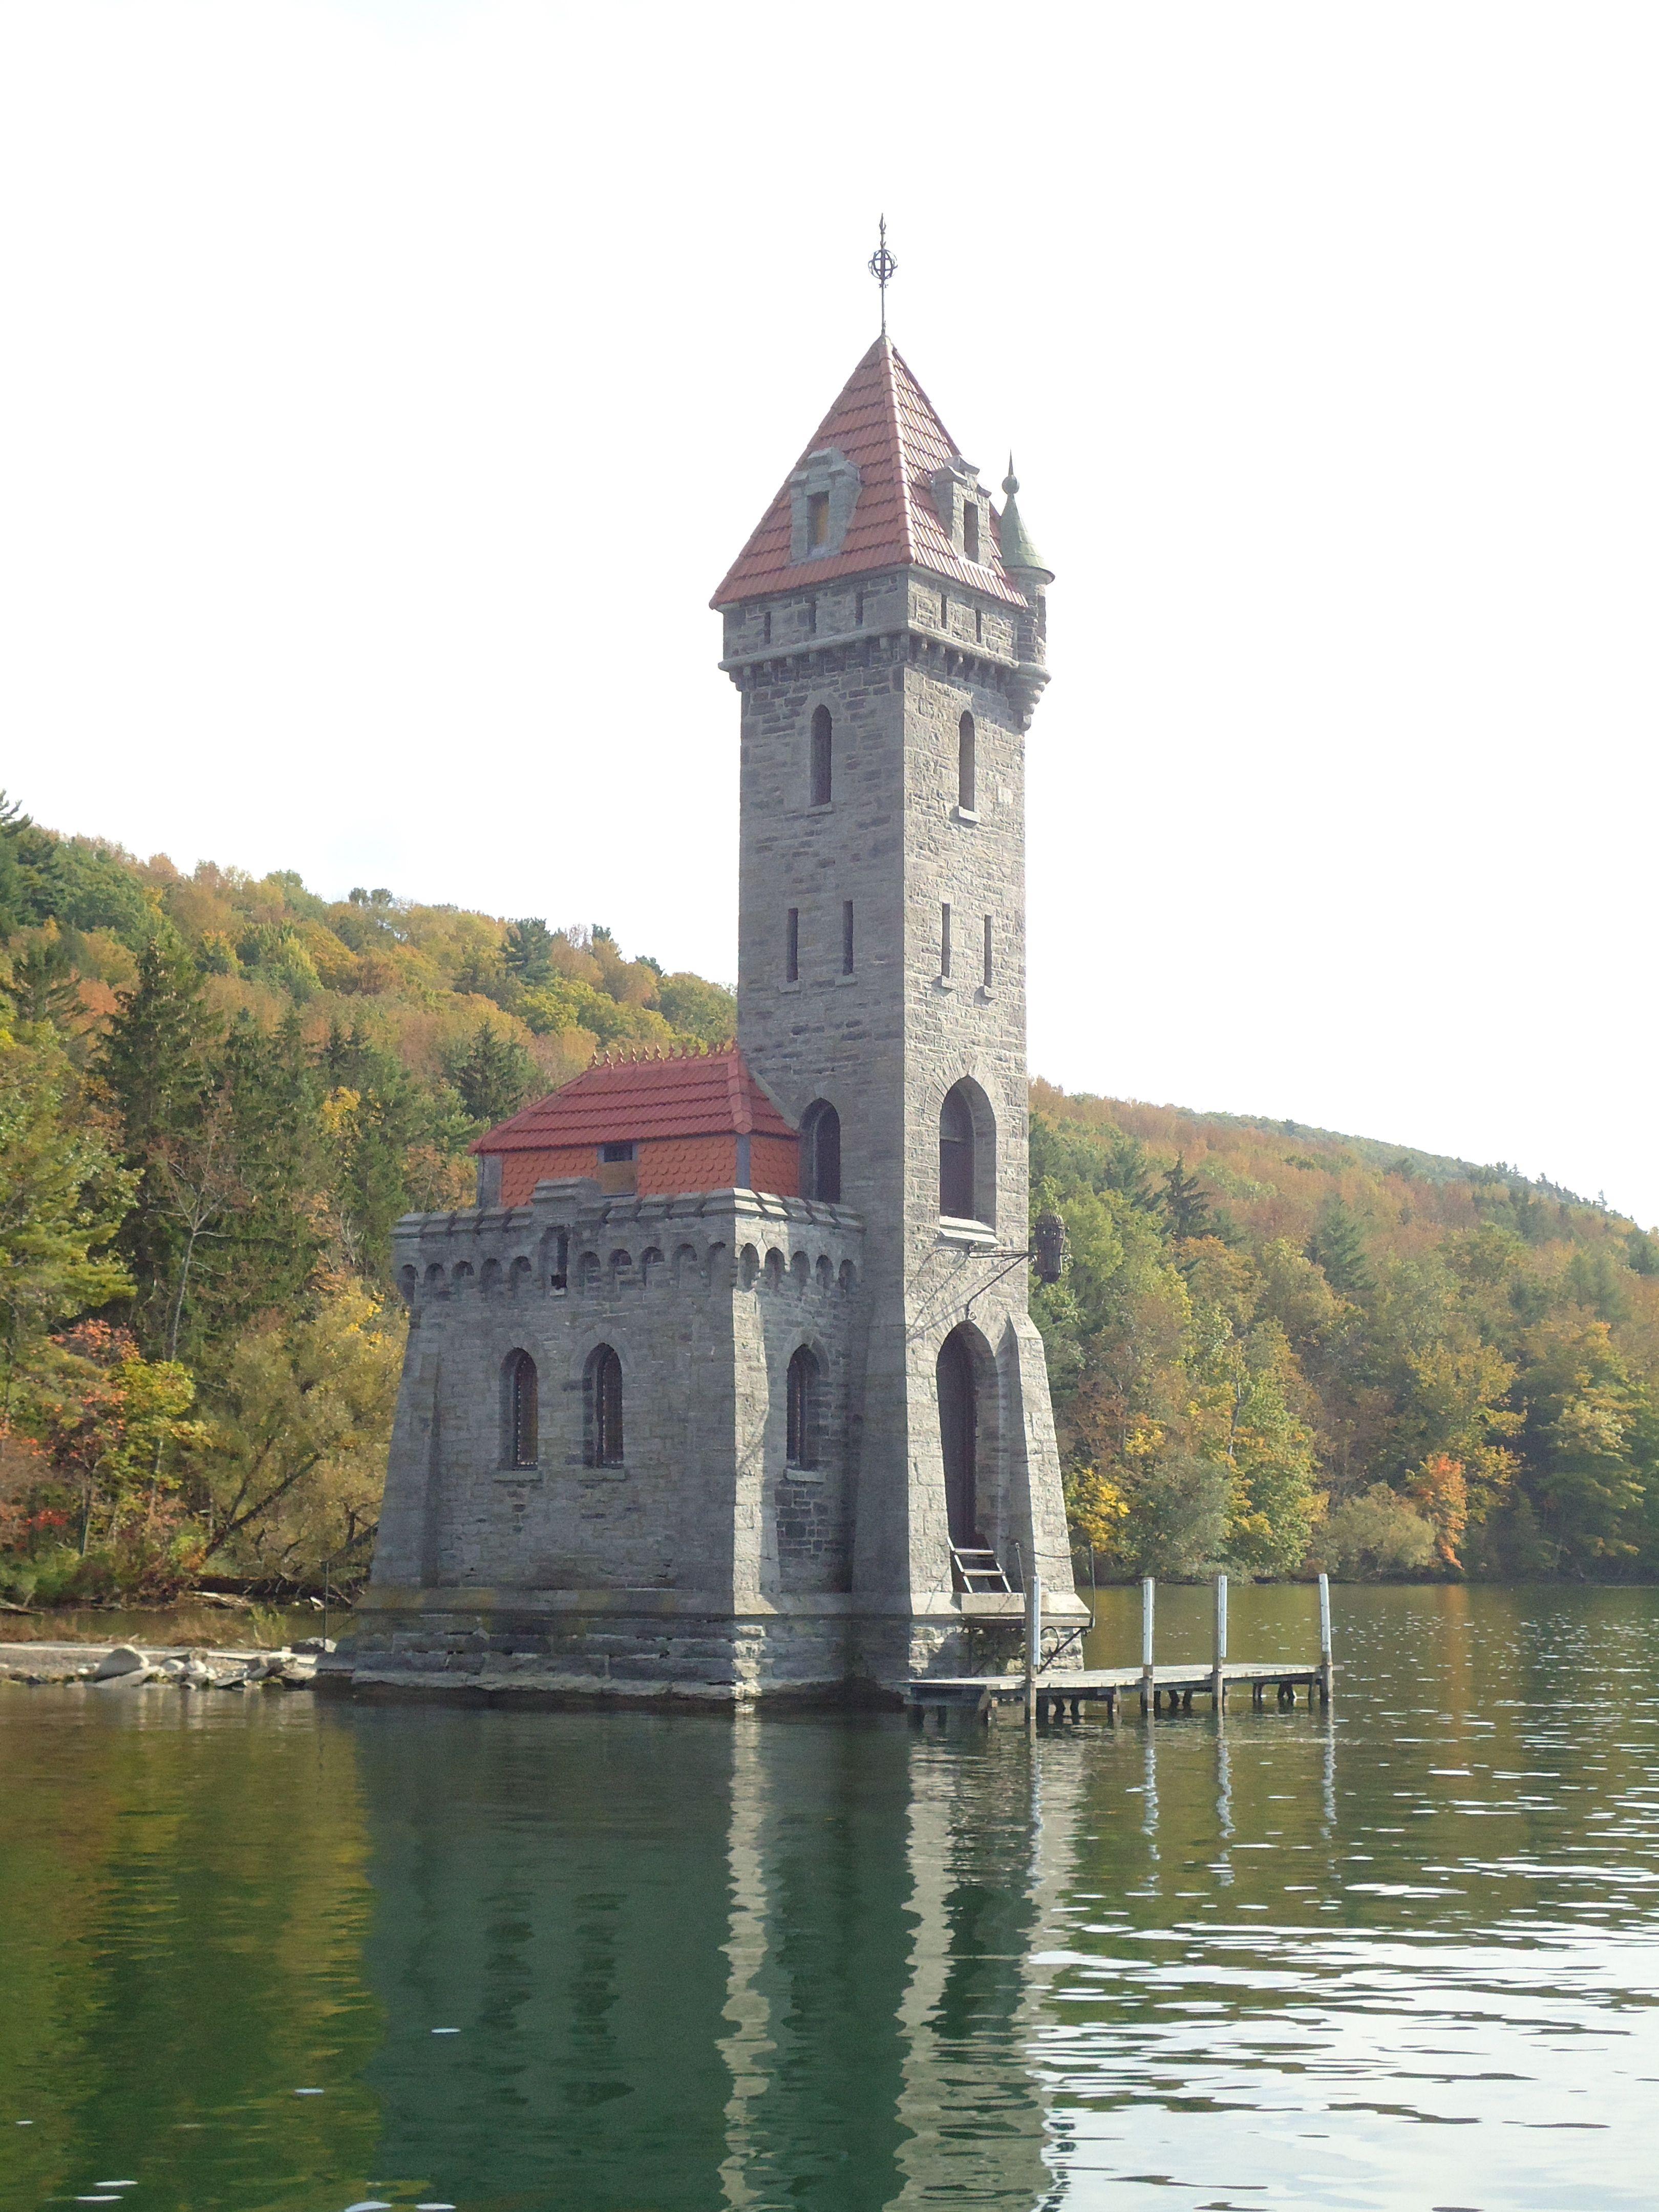 Kingfisher tower castle otsego lake ny roadside attractions kingfisherfingervillatowerstravelingcastlesmountainnyc